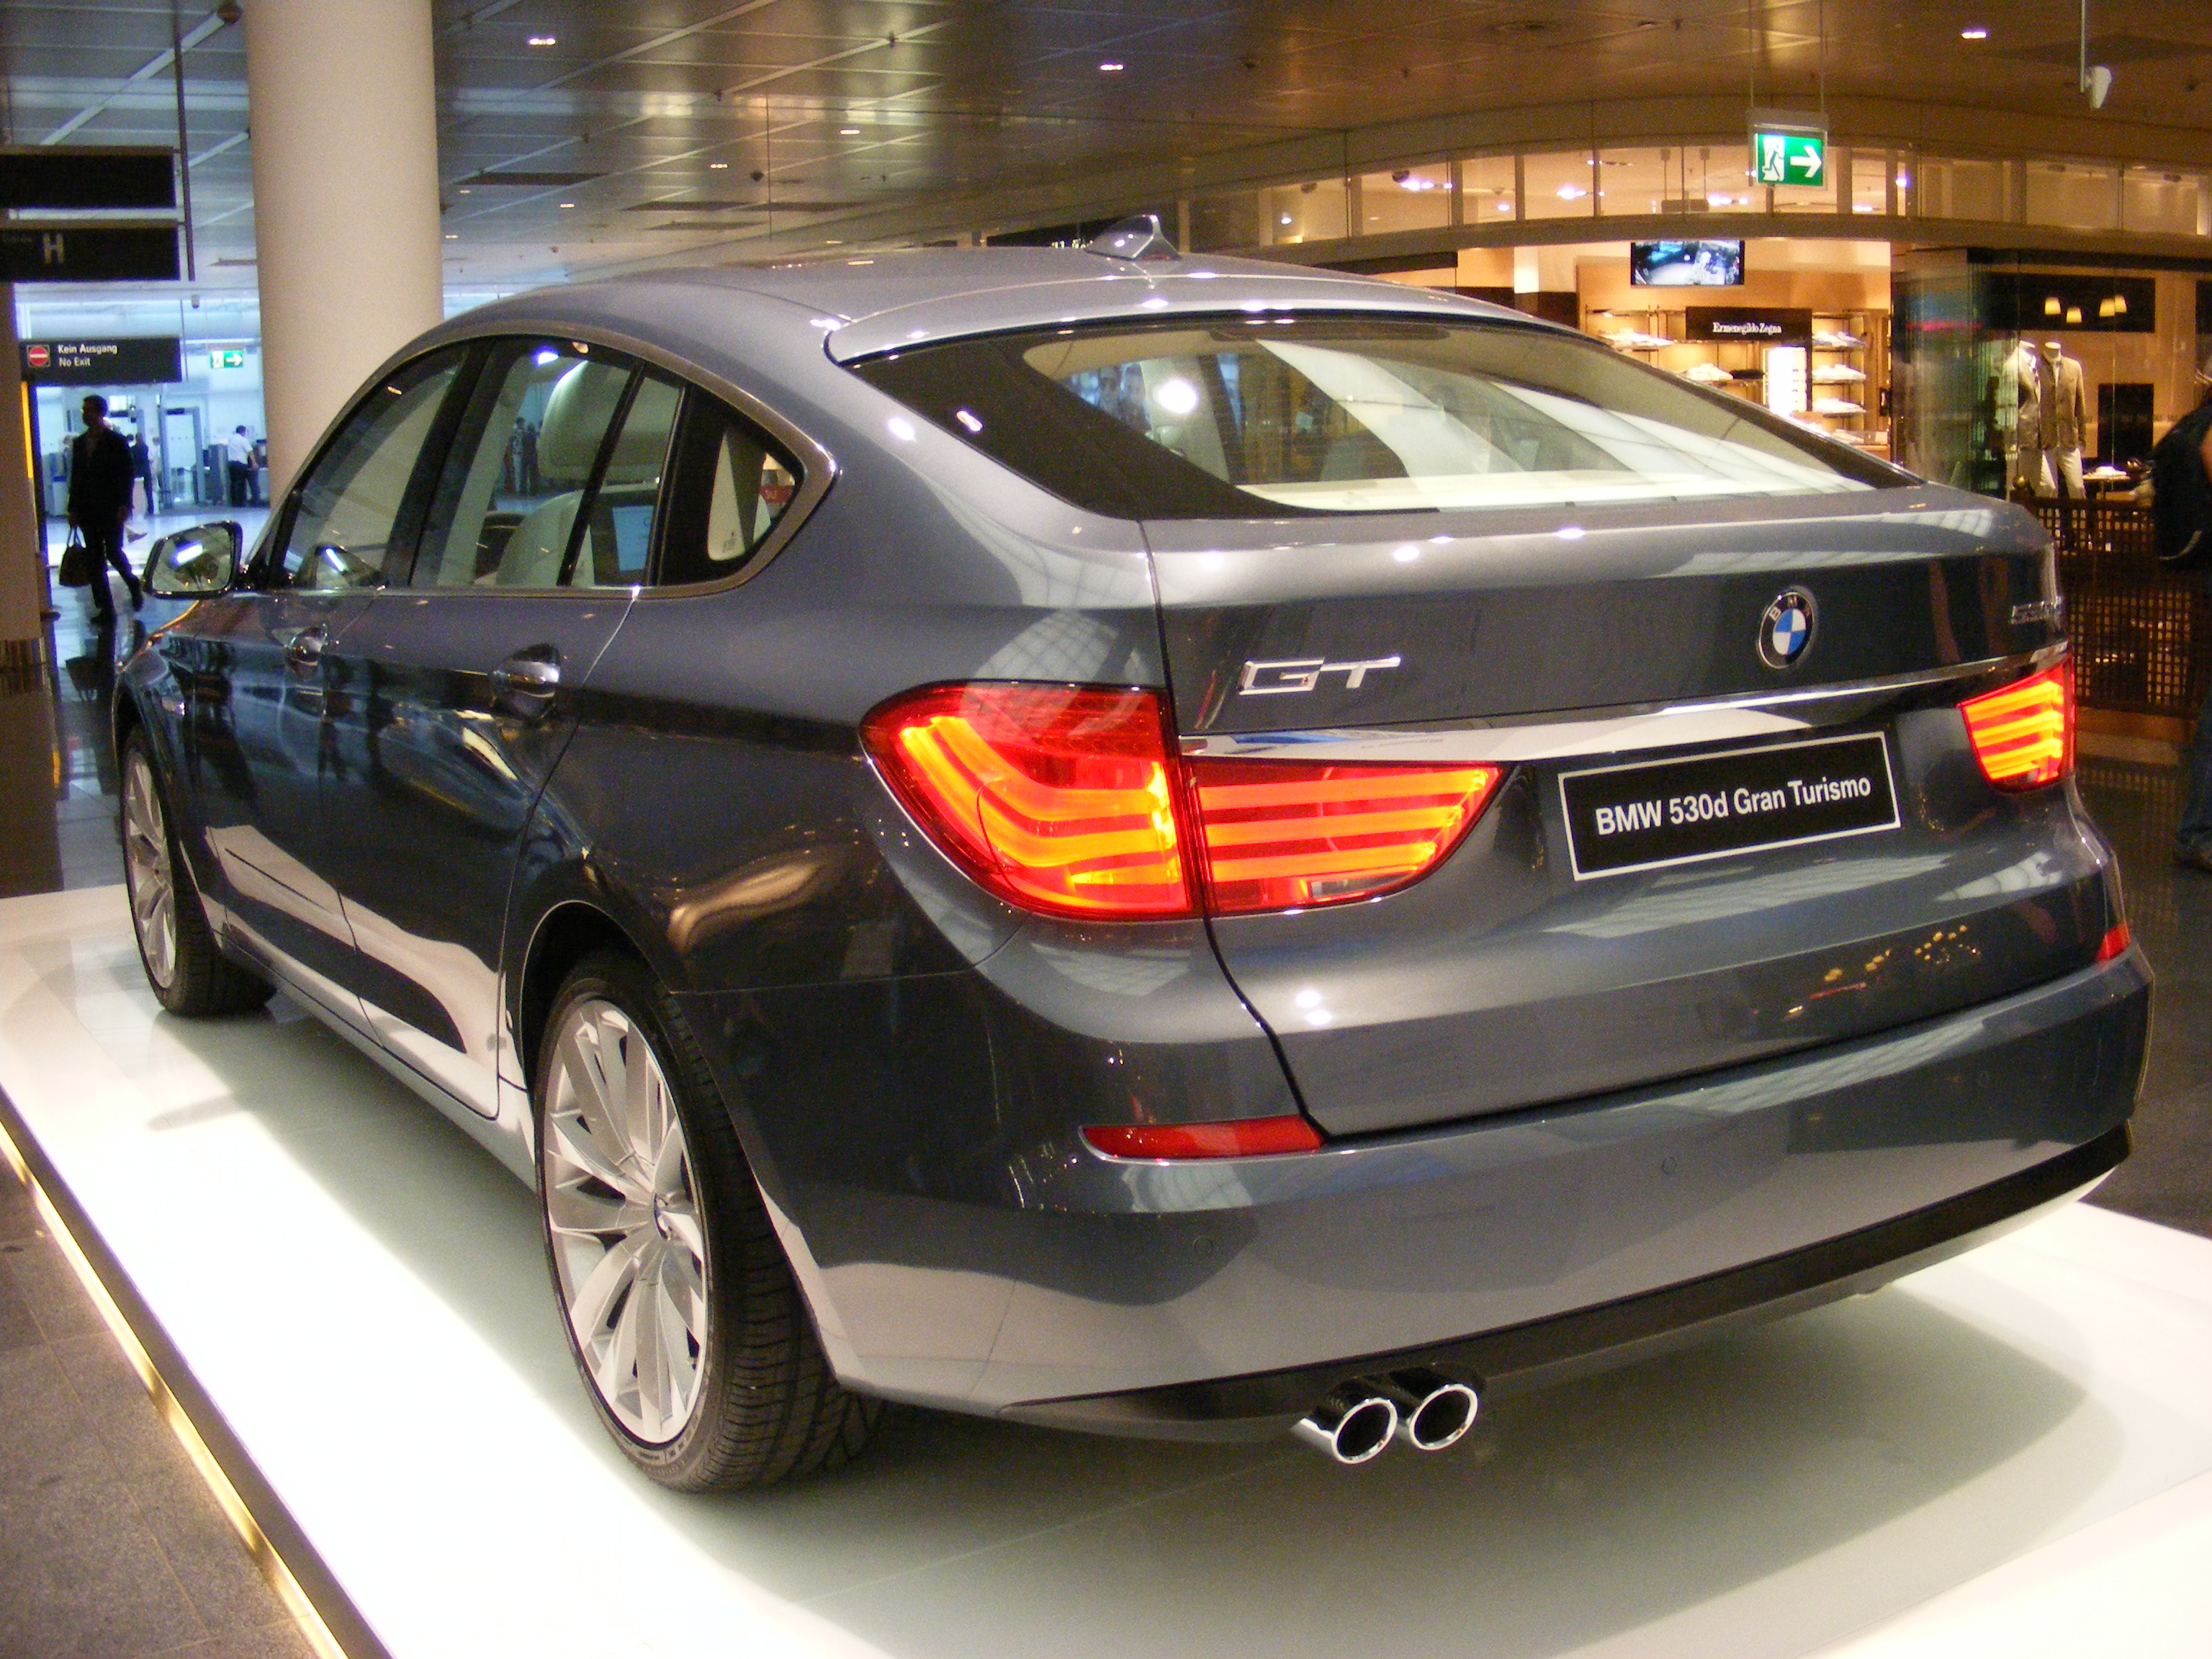 BMW_530d_Gran_Turismo_(2009)_-_rear.jpg